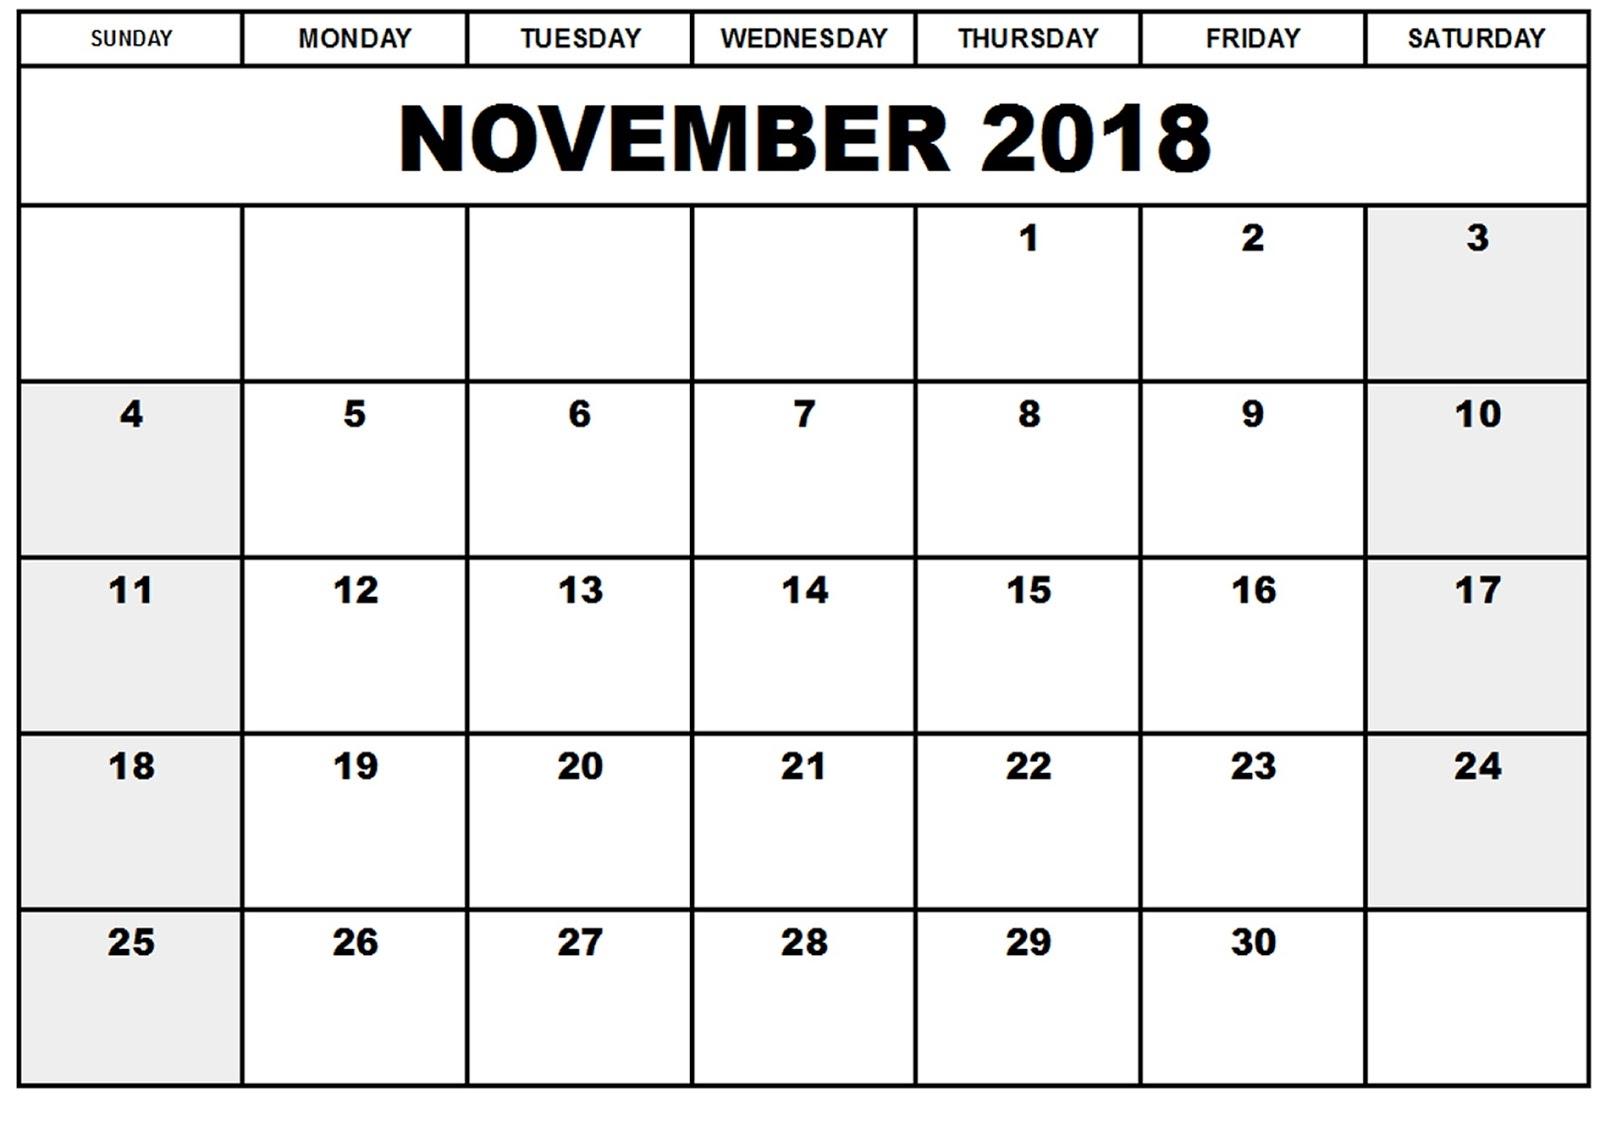 November 2018 Calendars The Calendar Spot Fieldstationco